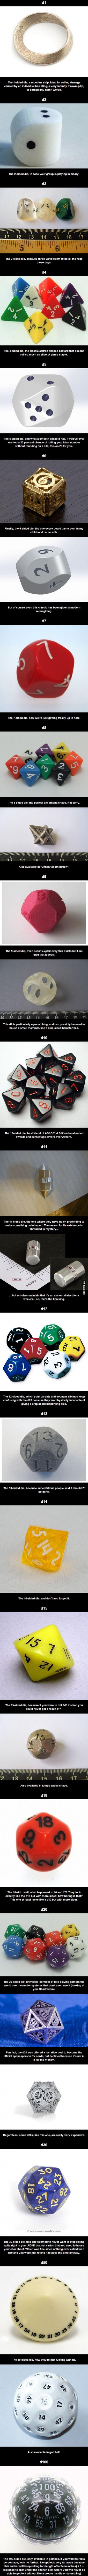 The Wonderful World of dice.